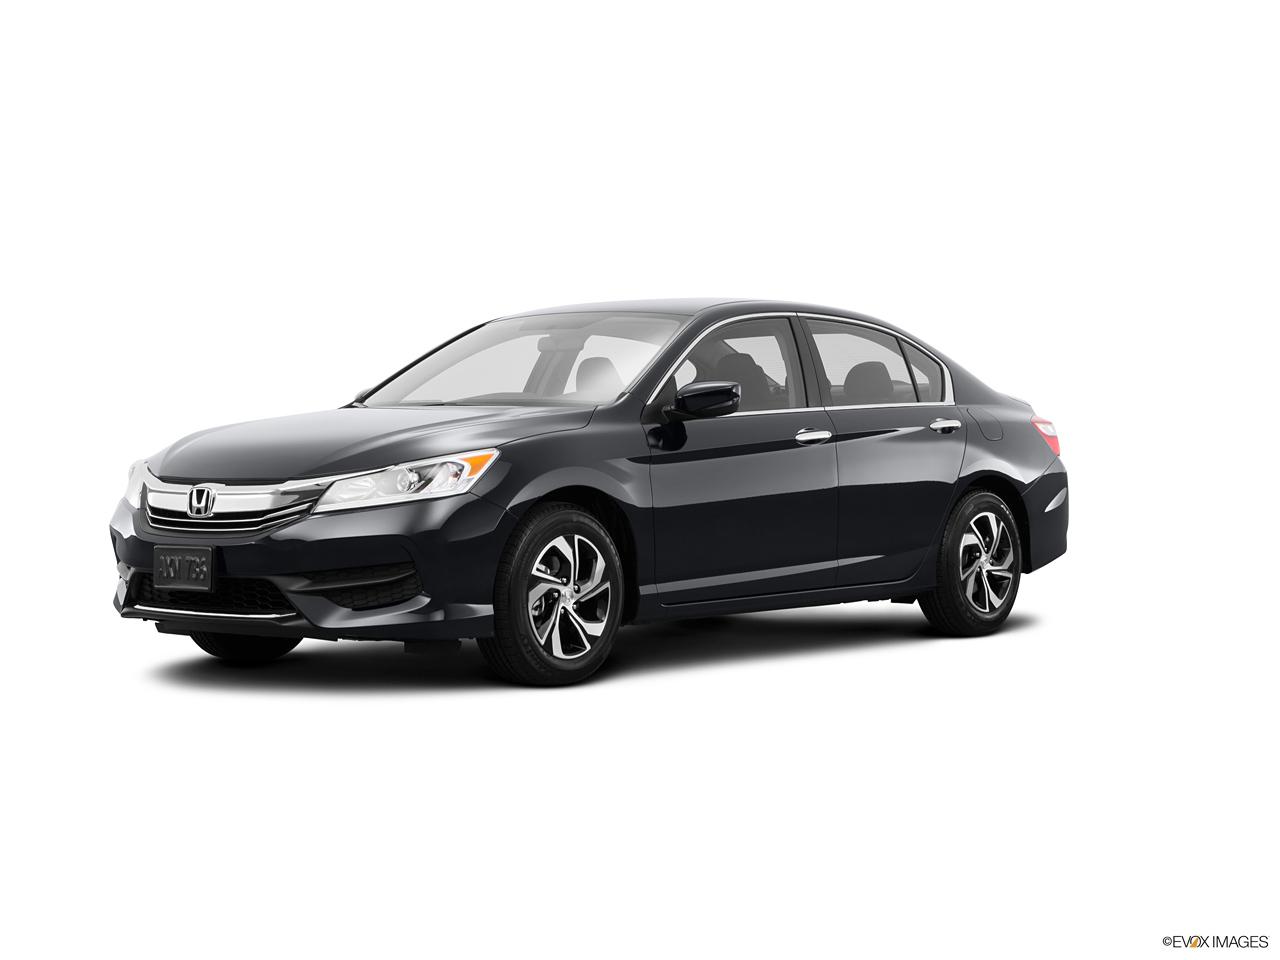 Honda Accord 2017 2 4l Lx In Kuwait New Car Prices Specs